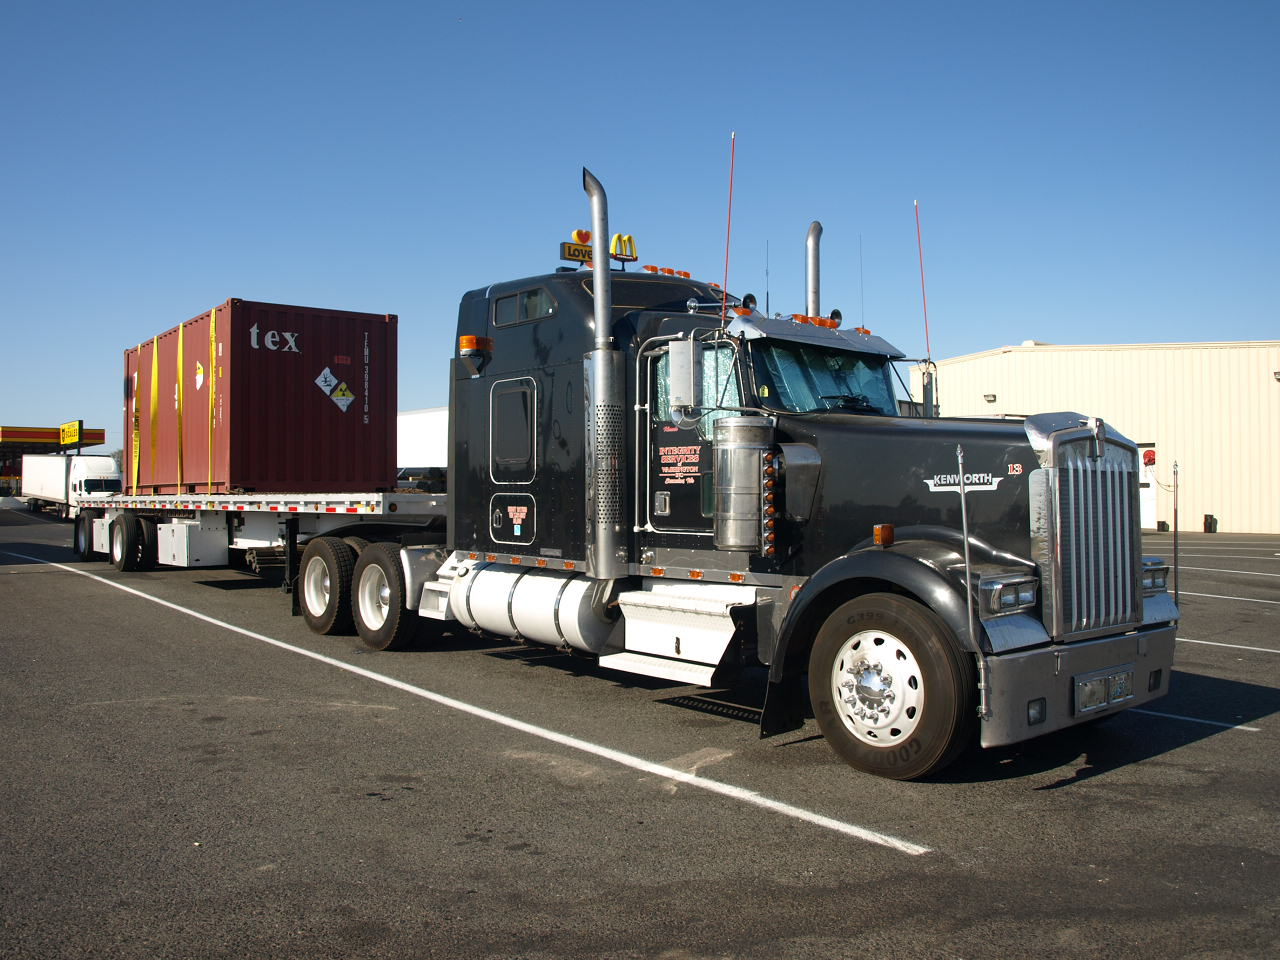 camion am ricain transport californie tats unis. Black Bedroom Furniture Sets. Home Design Ideas